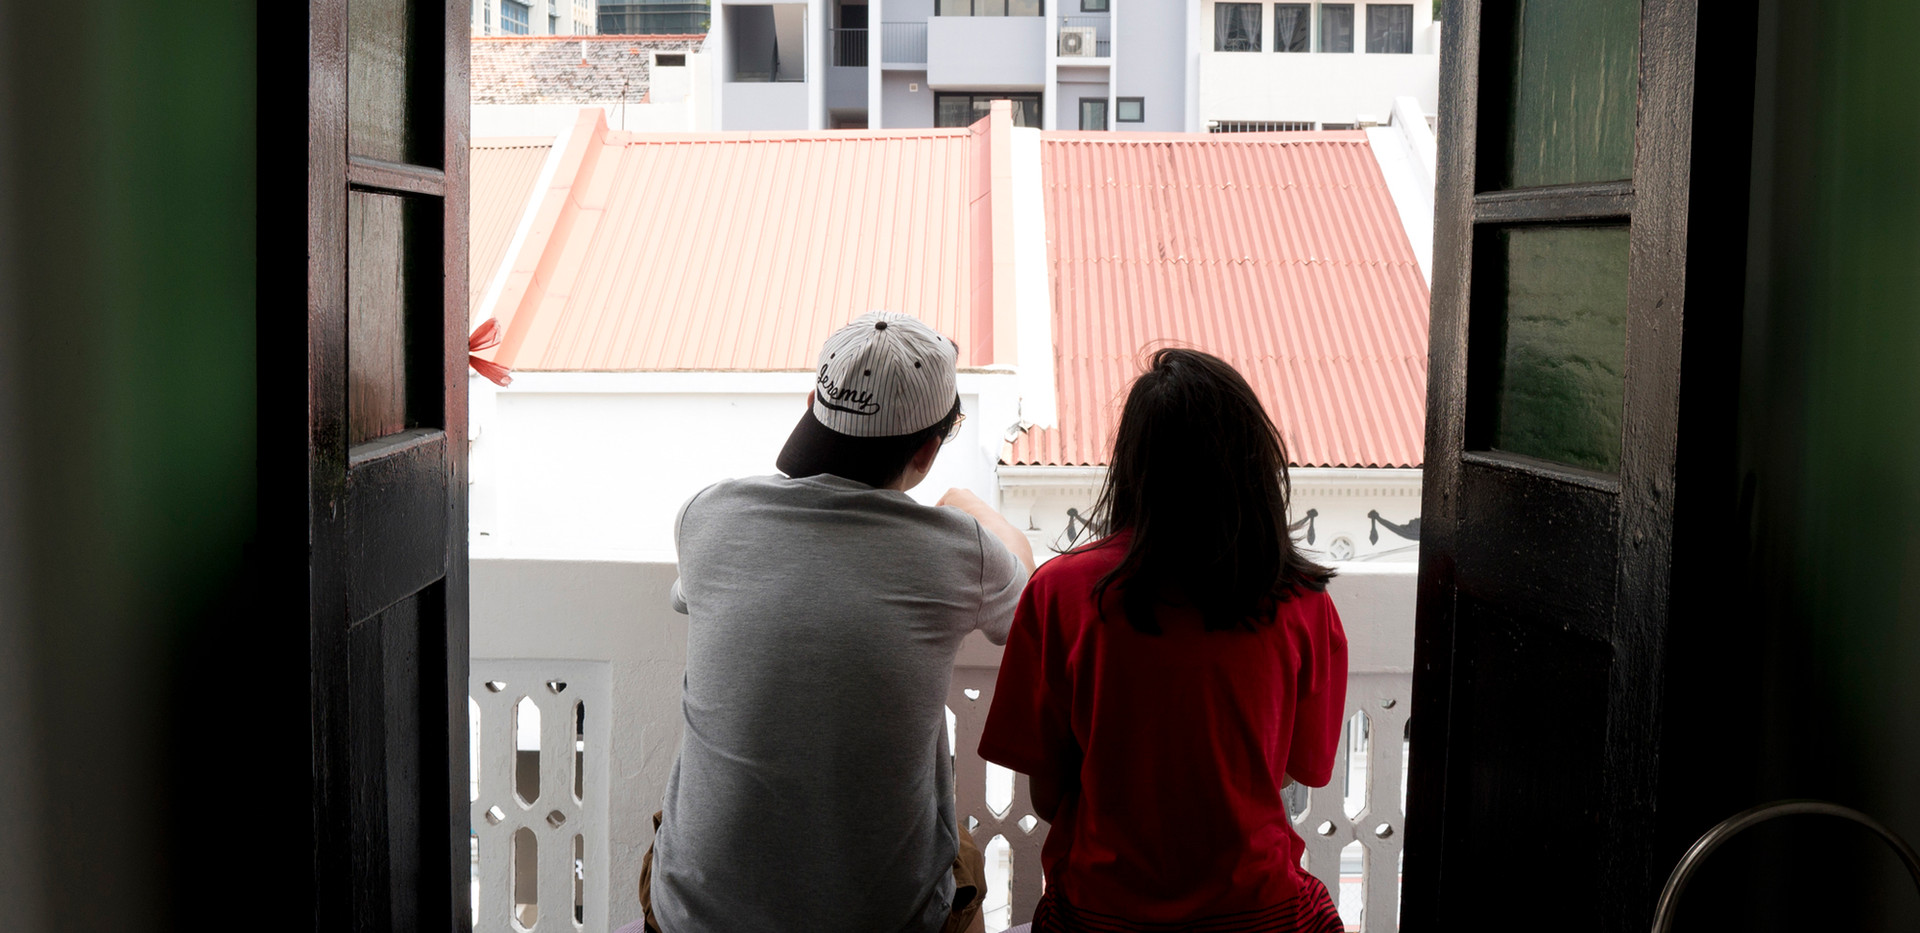 Balcony_9903.jpg